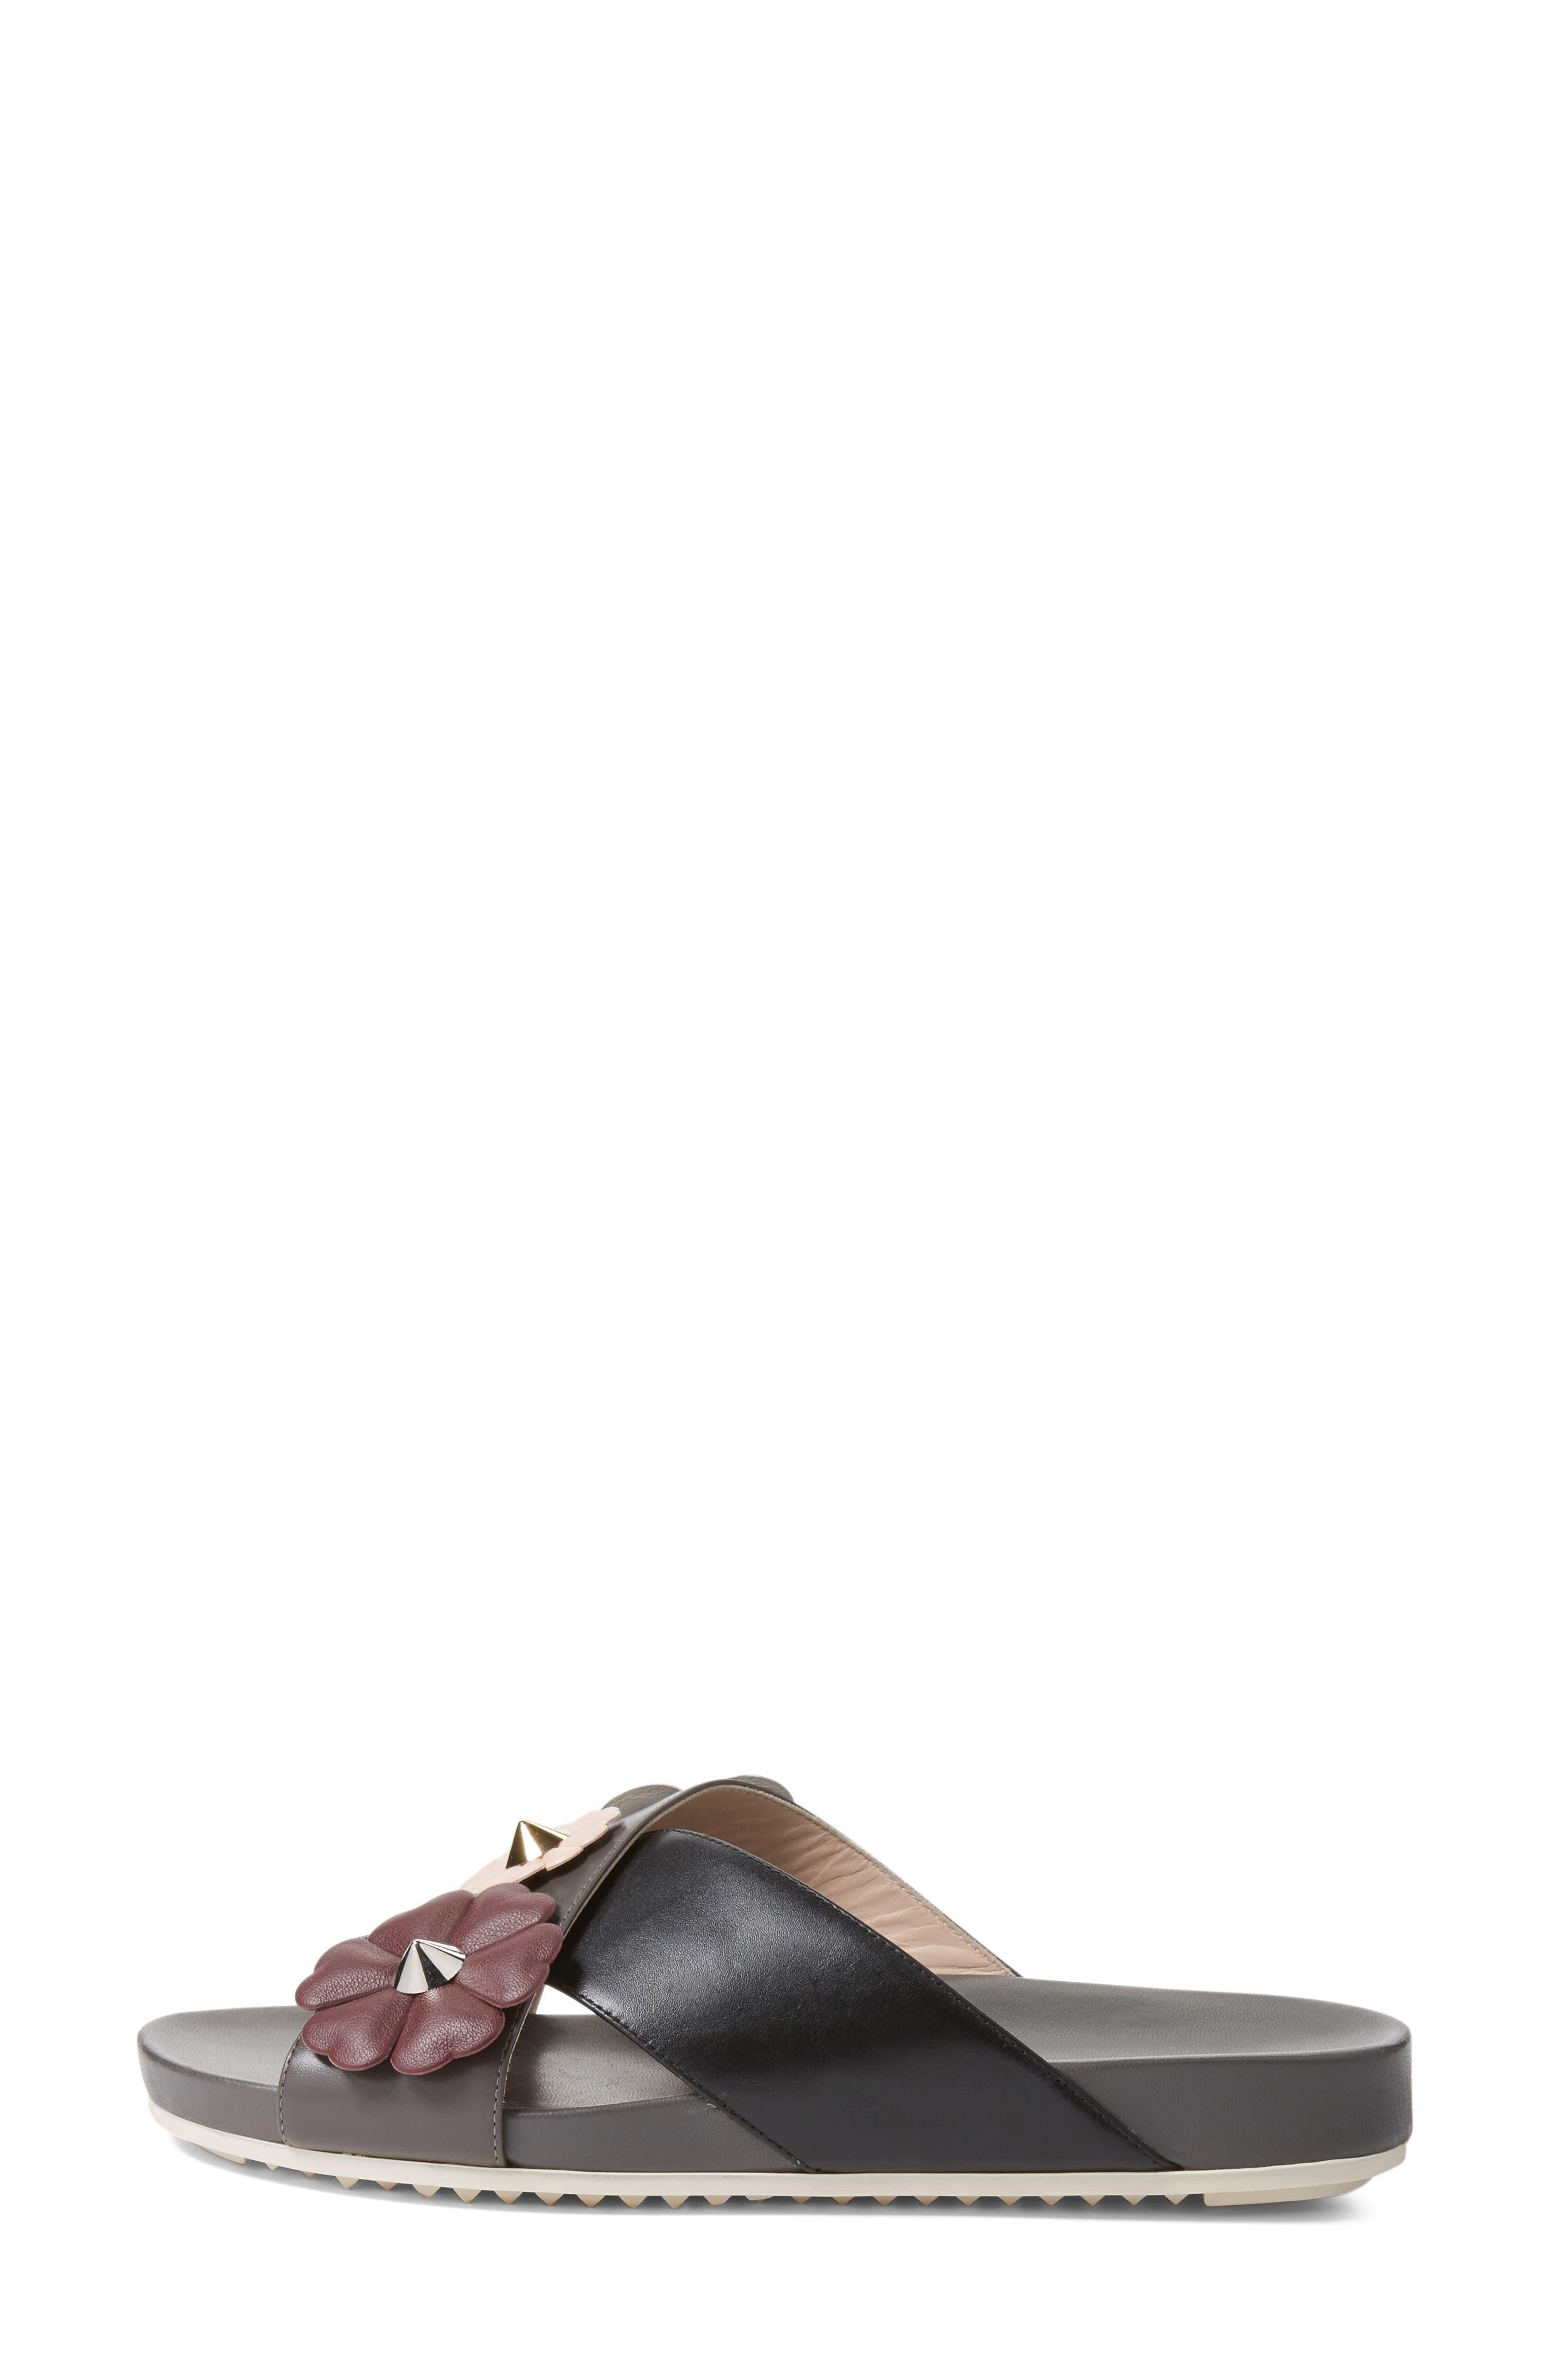 Flowerland Slide Sandal,                             Alternate thumbnail 3, color,                             Black/ Purple